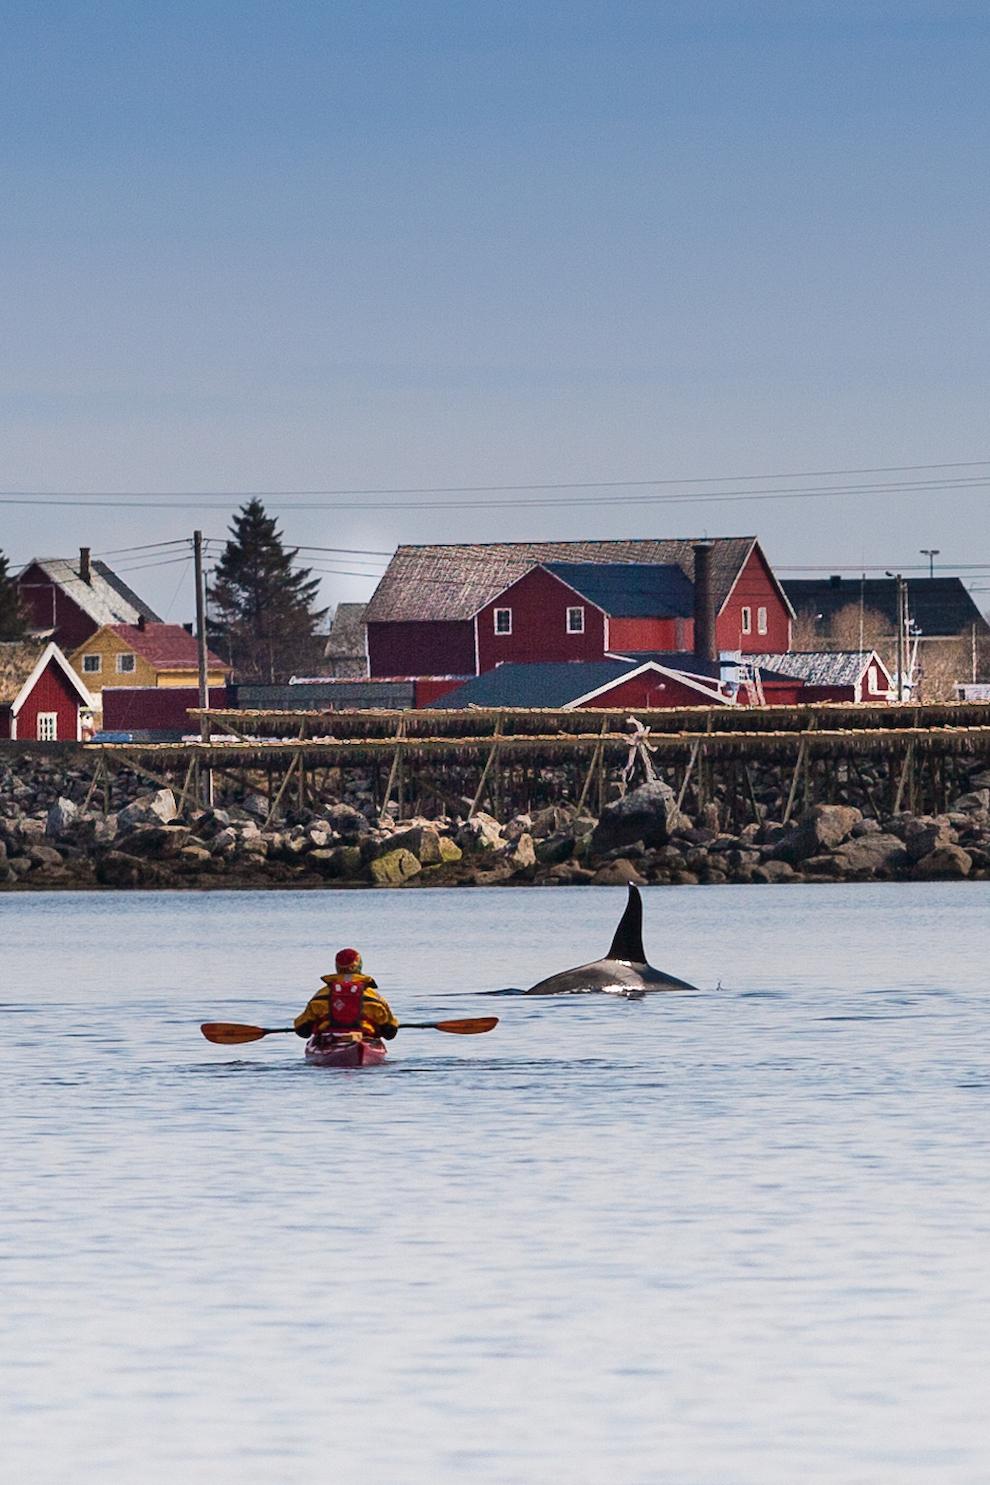 In luna mai, balenele ucigase se intorc in Lofoten si fac un popas in Reinefjord. Sa te plimbi cu caiacul sau cu barca printre balenele ucigase e o experienta minunata.